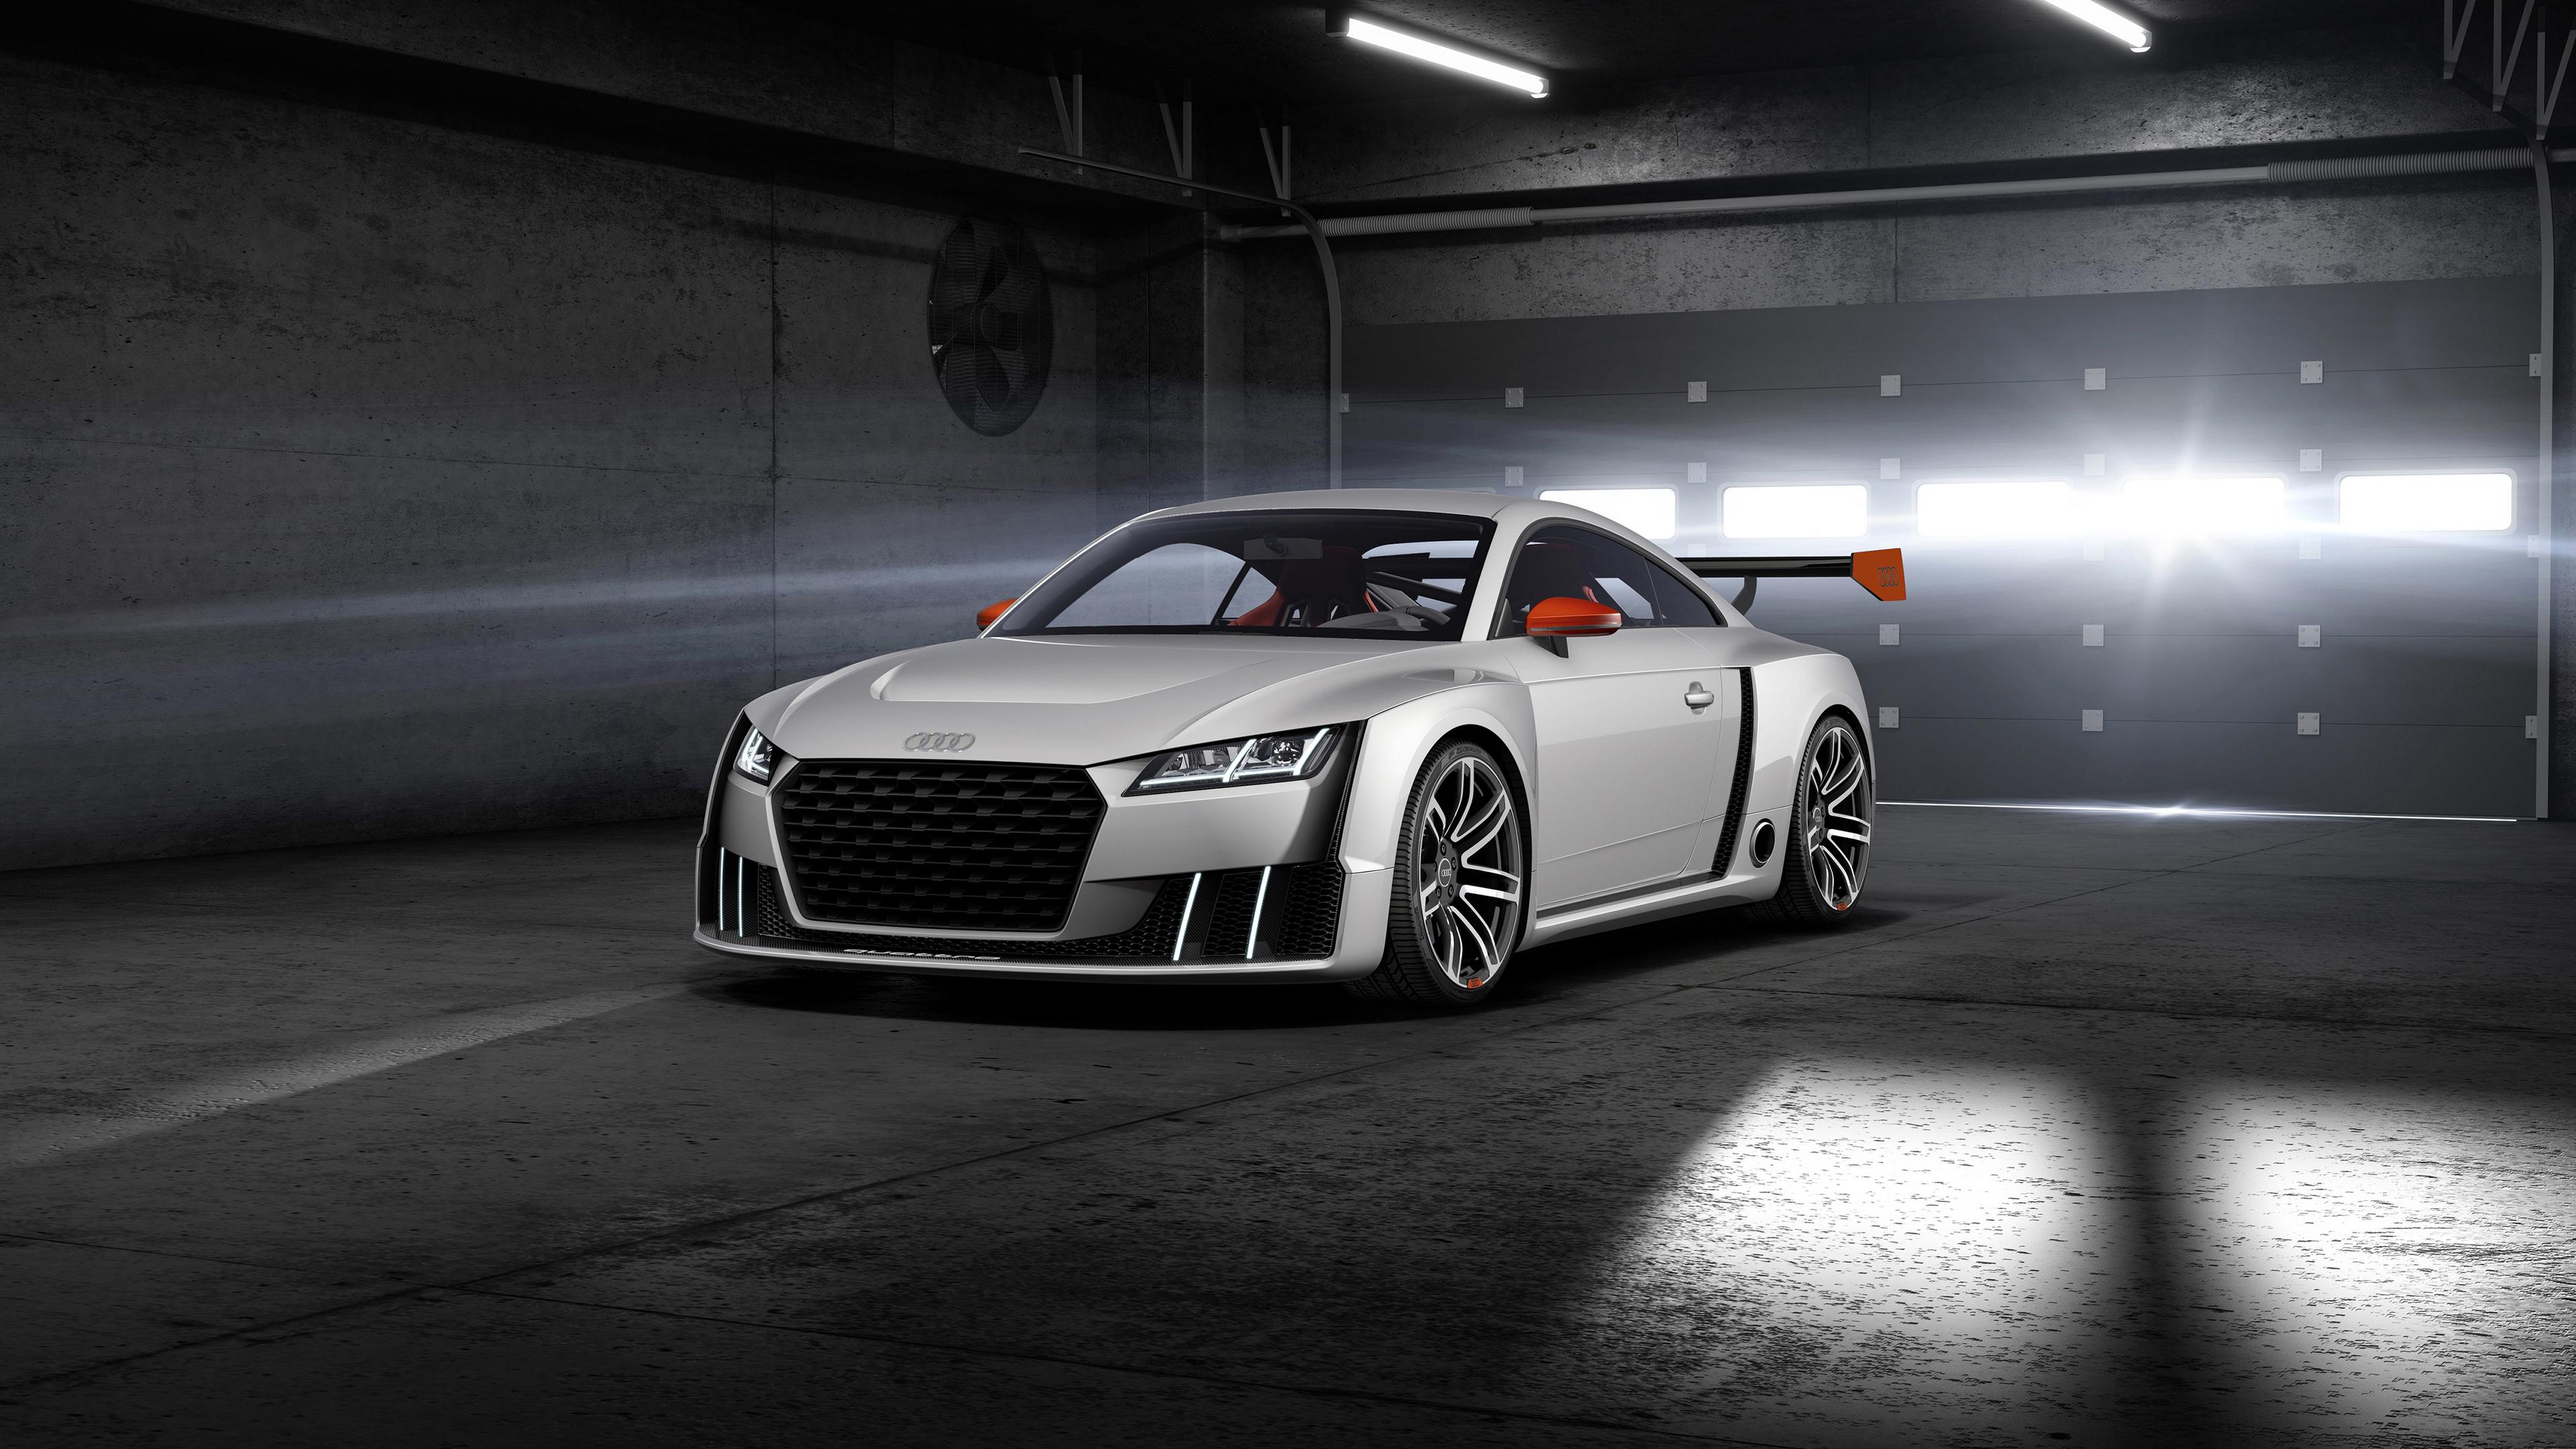 Автомобиль белый